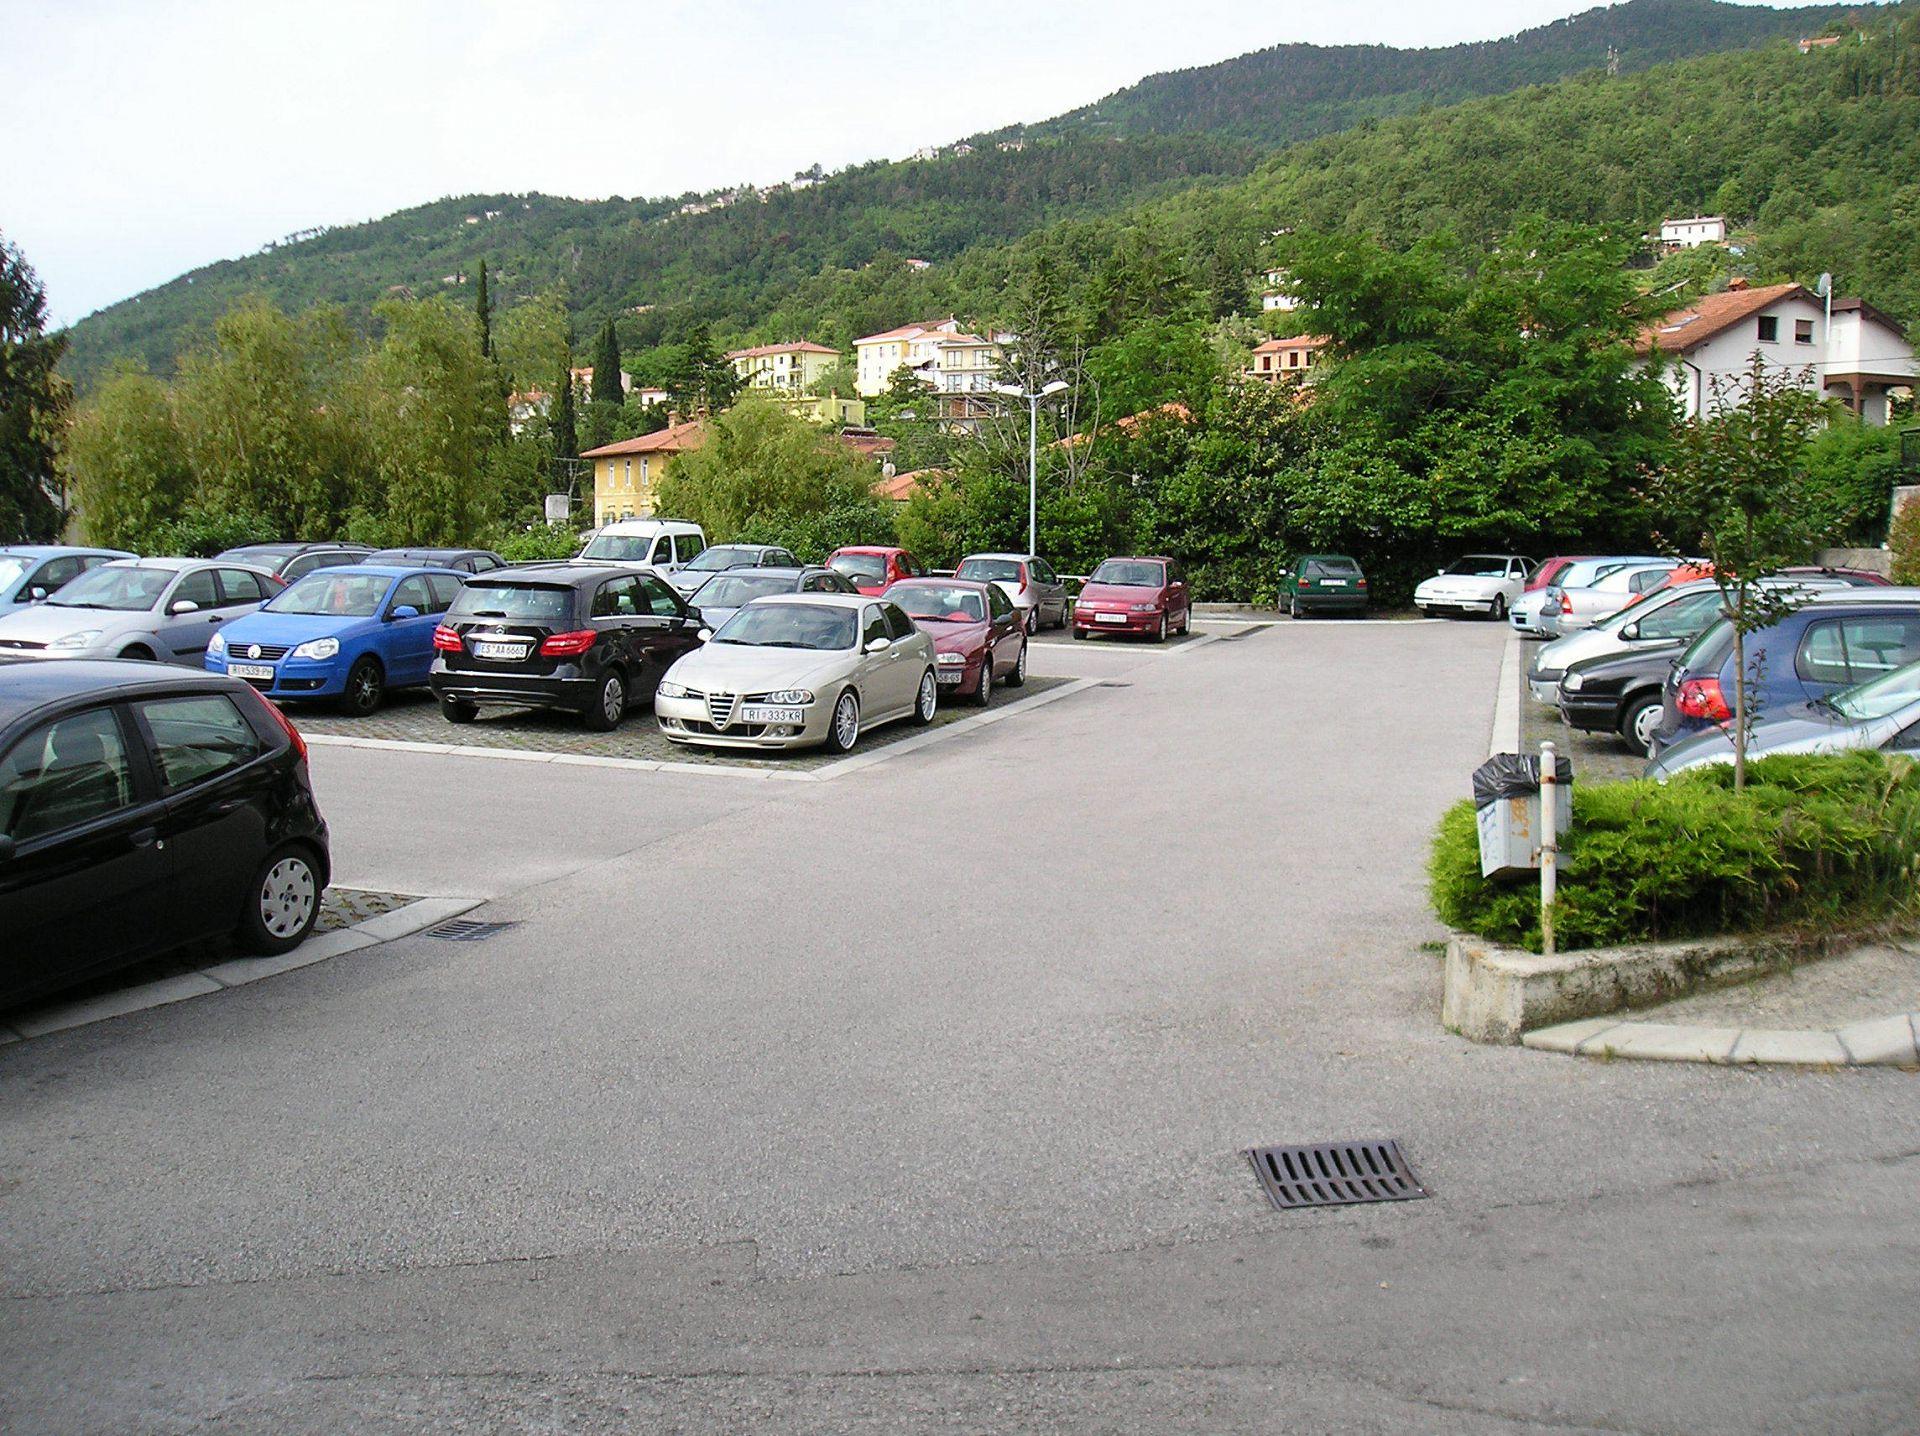 5751 - Lovran - Apartments Croatia - parking